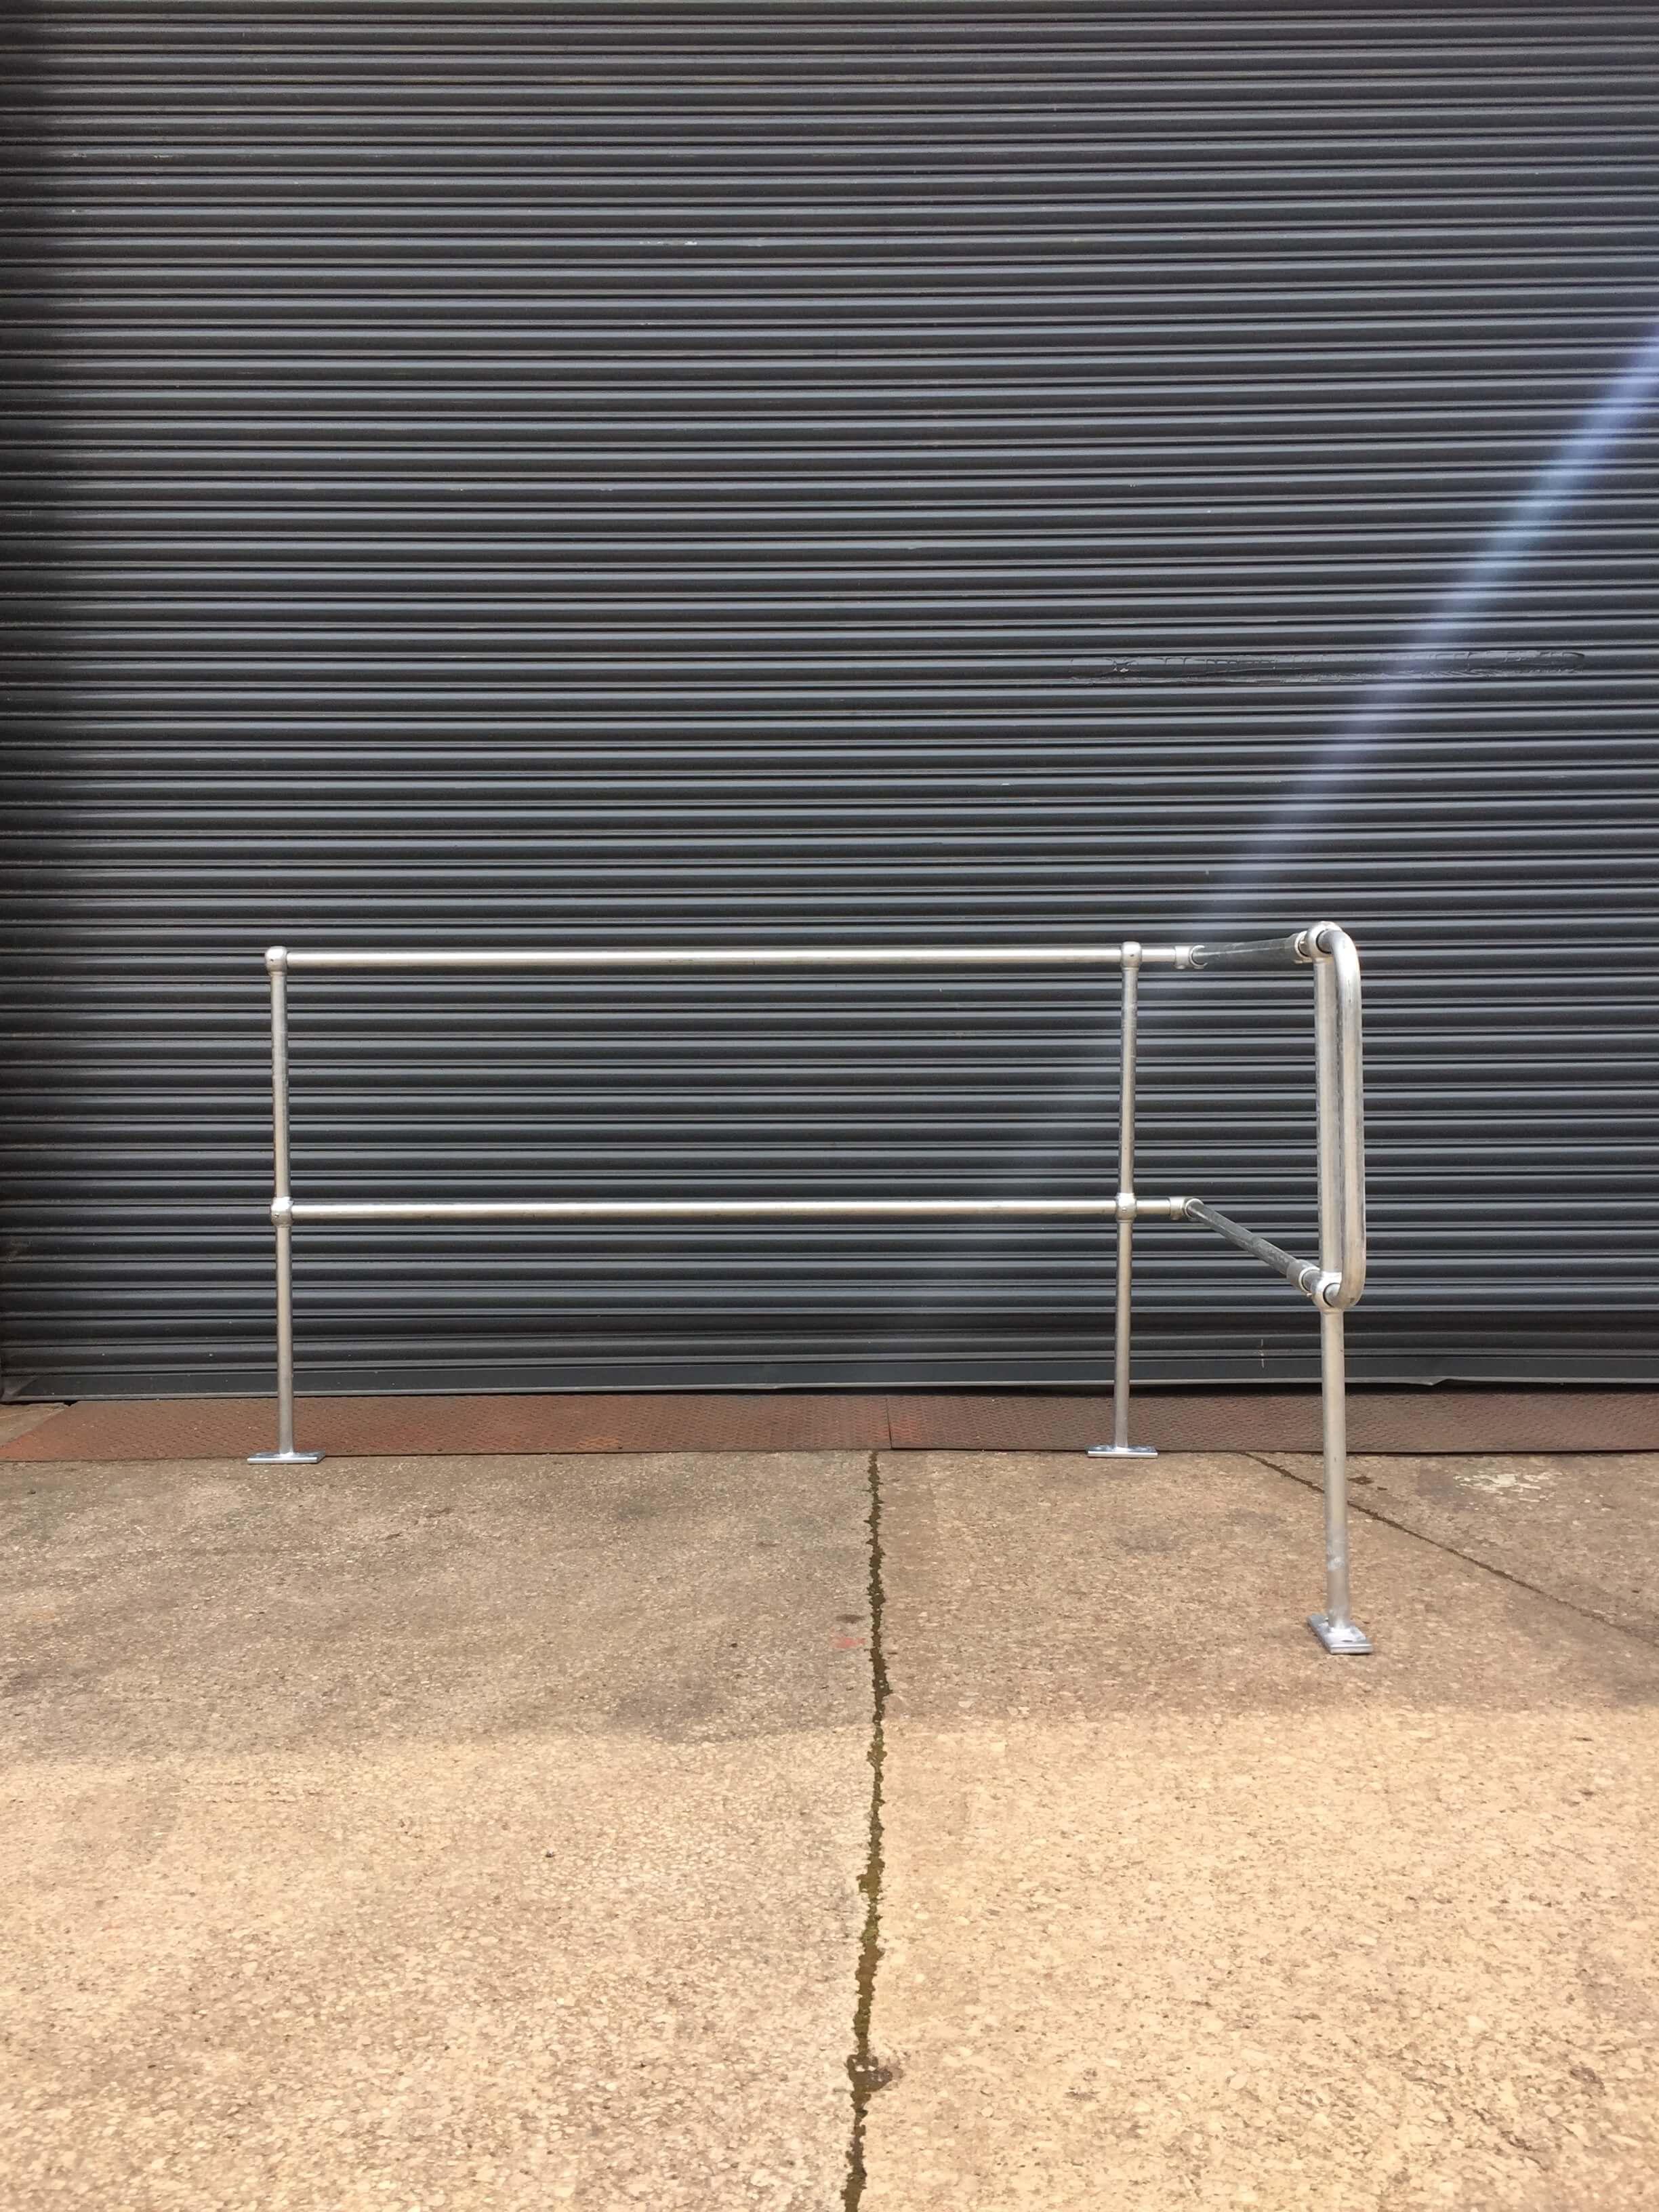 Galvanised Tubular Handrail Post Type 1A - Handrail Safety ...